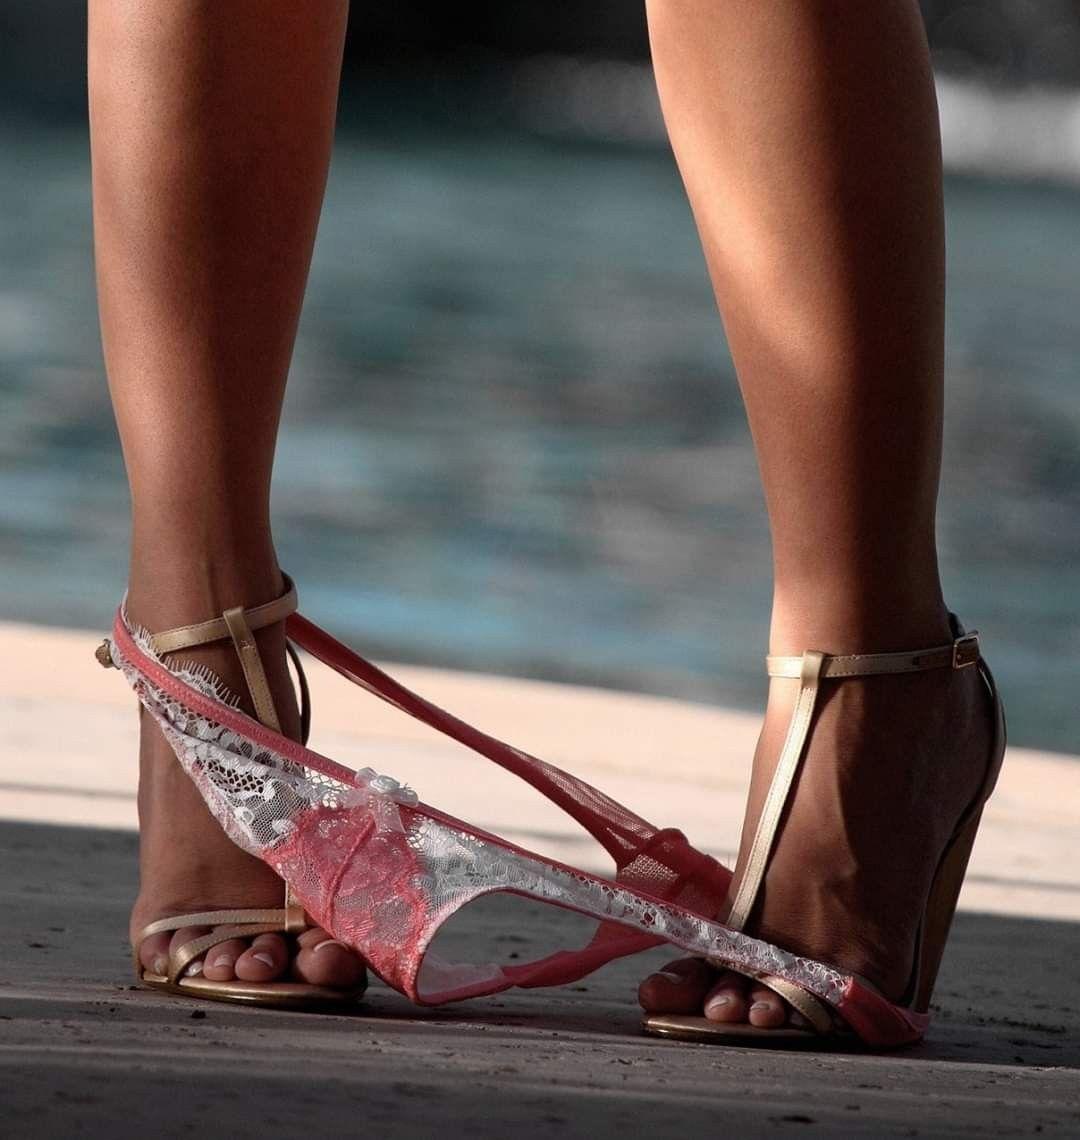 Pin By Fred Slerger On Svleceny In 2020 Heels High Heels Kitten Heels